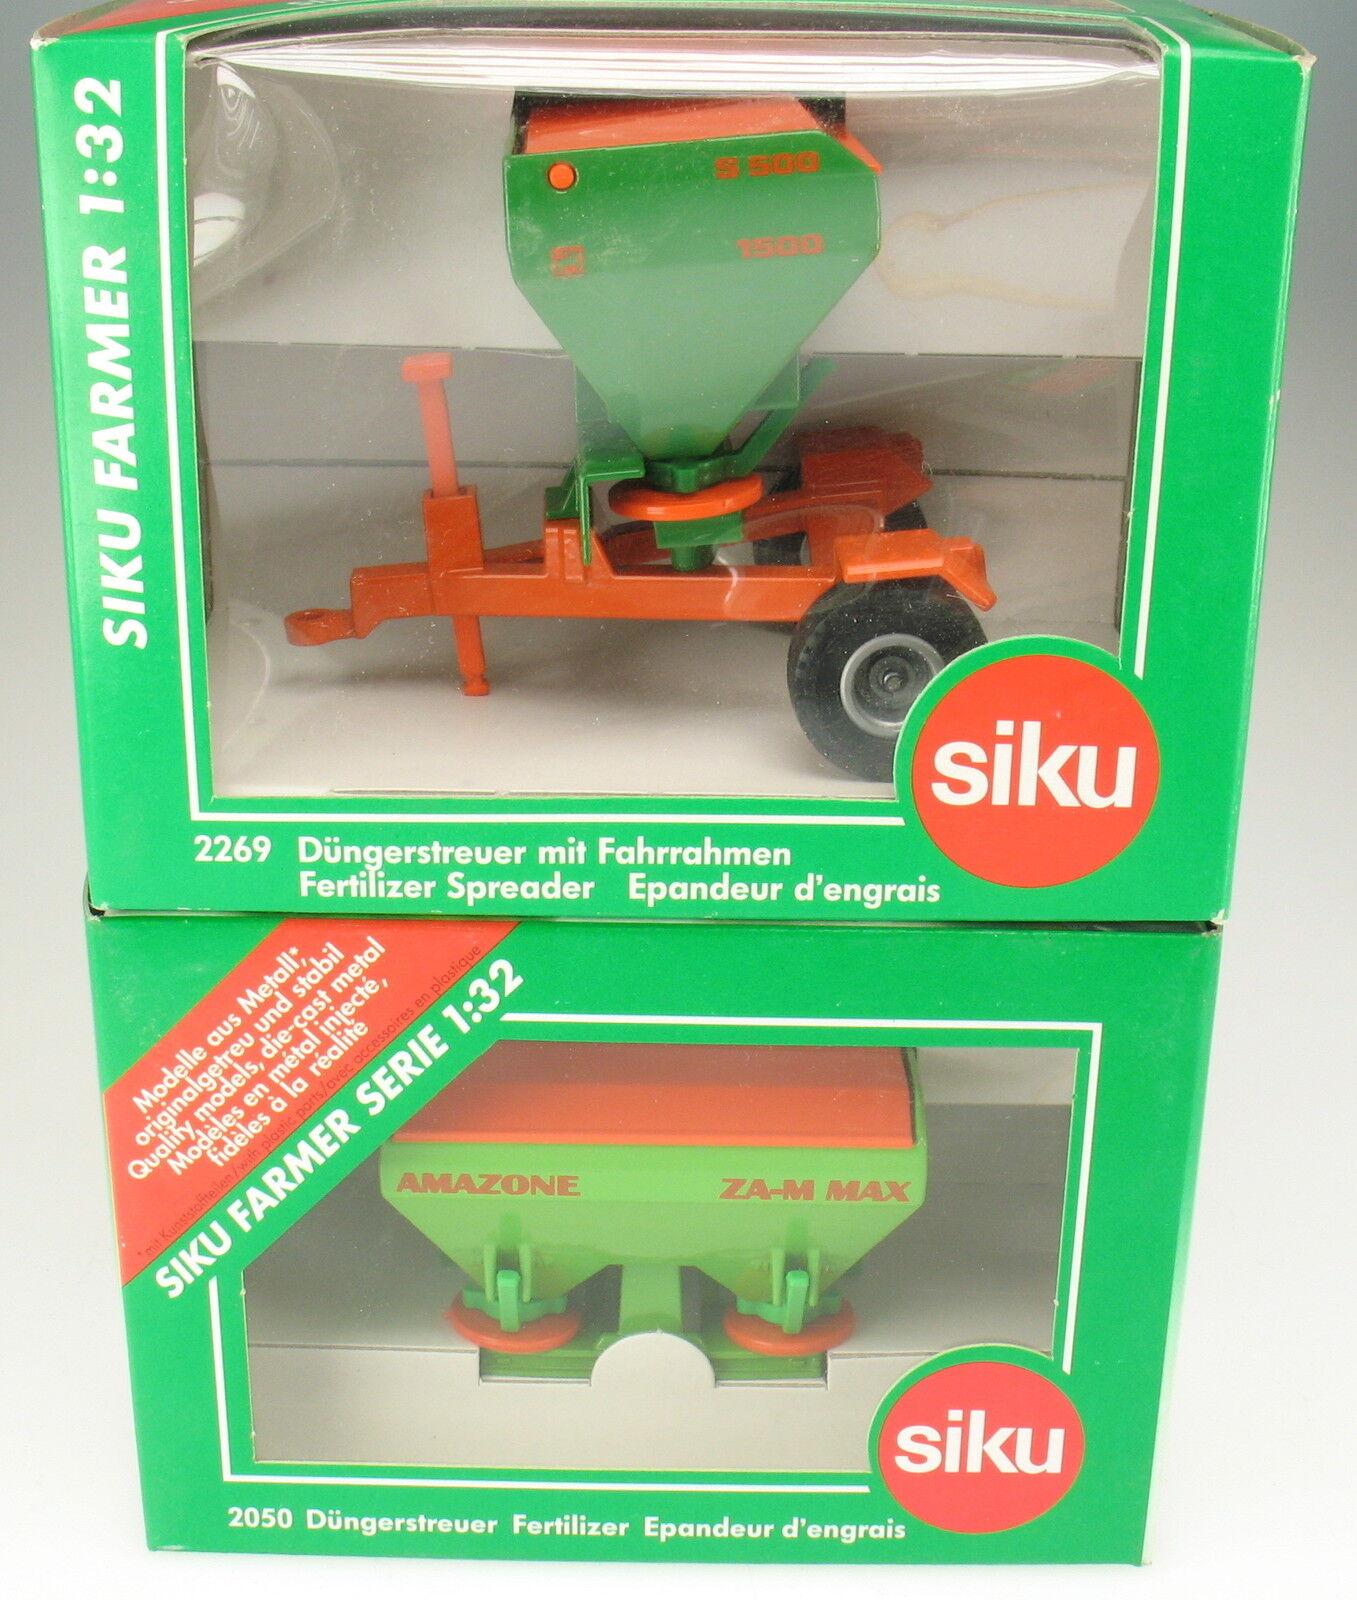 SIKU FARMER 2269 + 2050 - Düngerstreuer mit u ohne Fahrrahmen - NEU in OVP -1 32